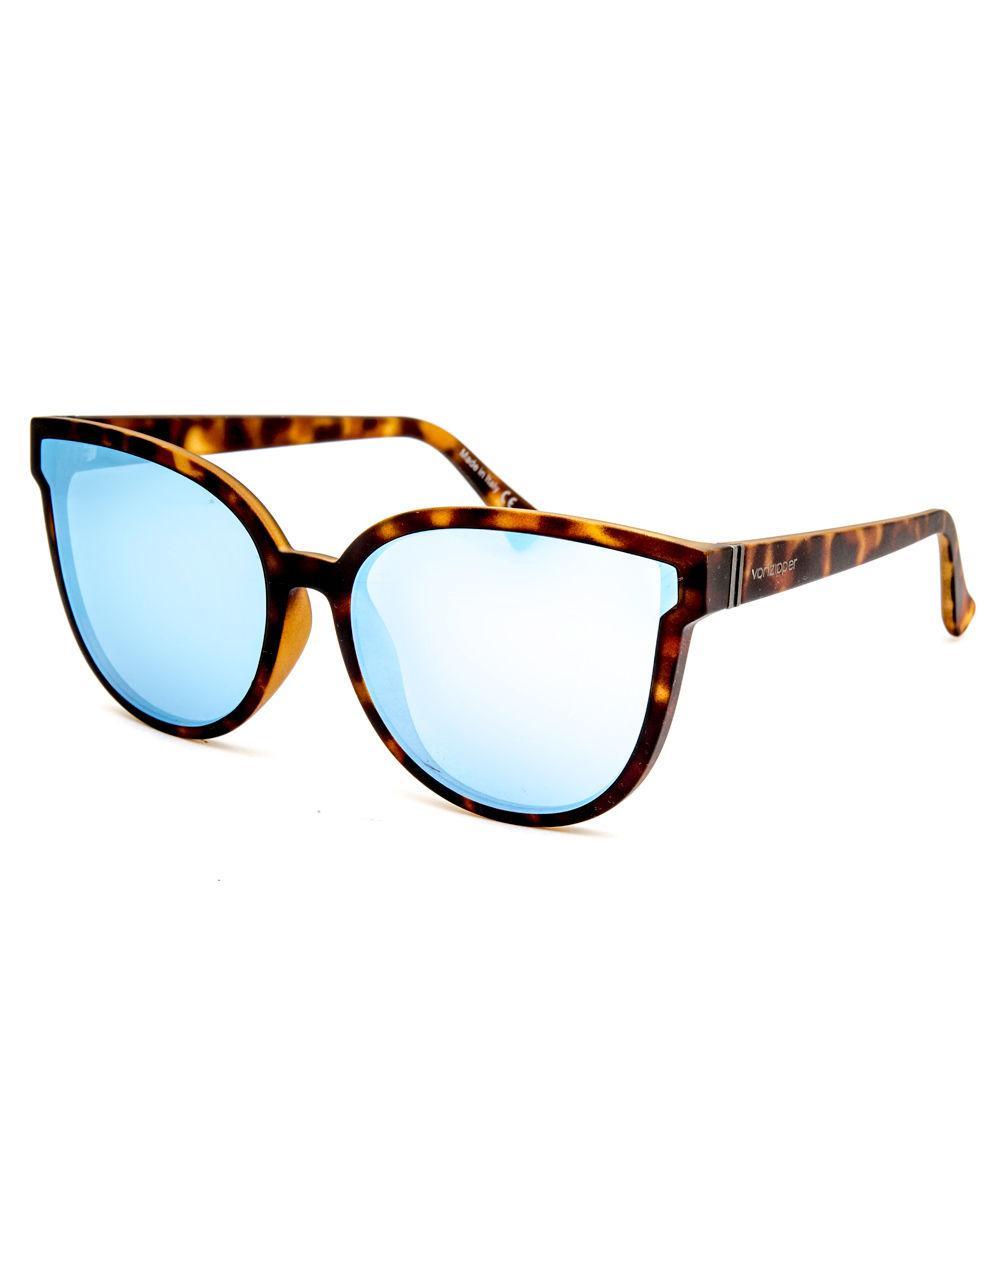 cbe8c41b23 Lyst - Von Zipper Fairchild Tortoise Sunglasses in Blue